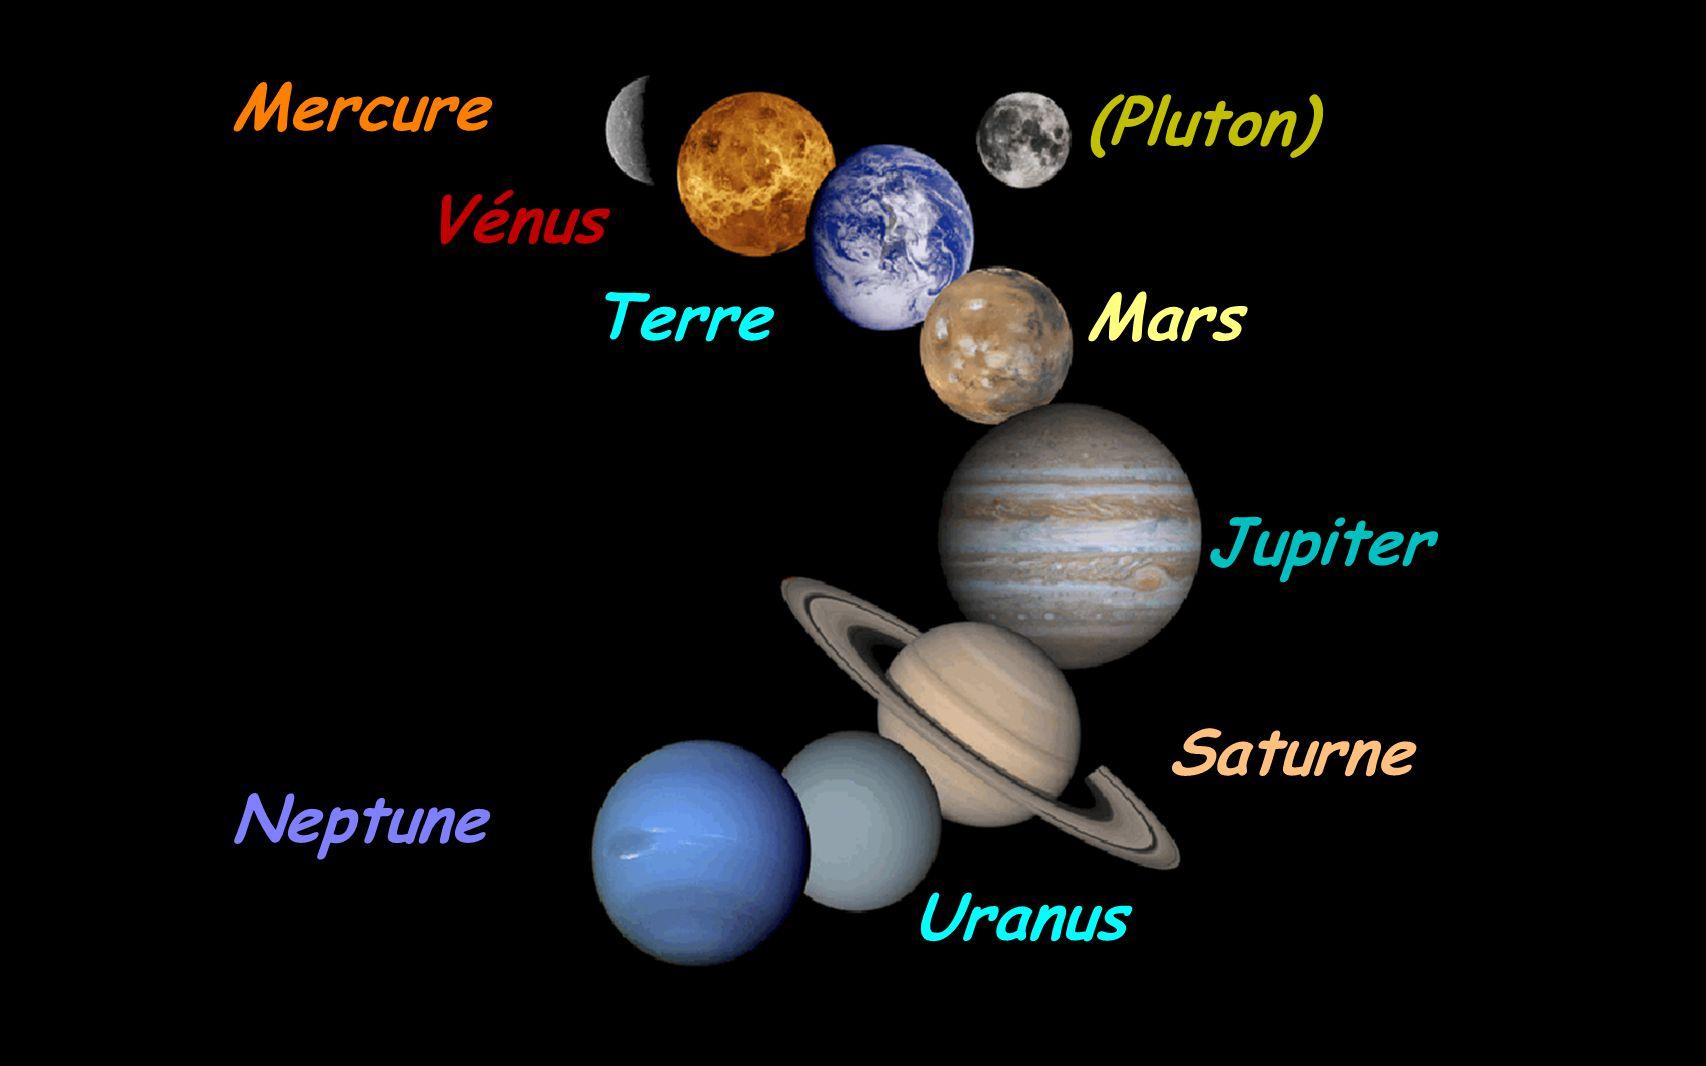 Mercure (Pluton) Vénus Terre Mars Jupiter Saturne Neptune Uranus